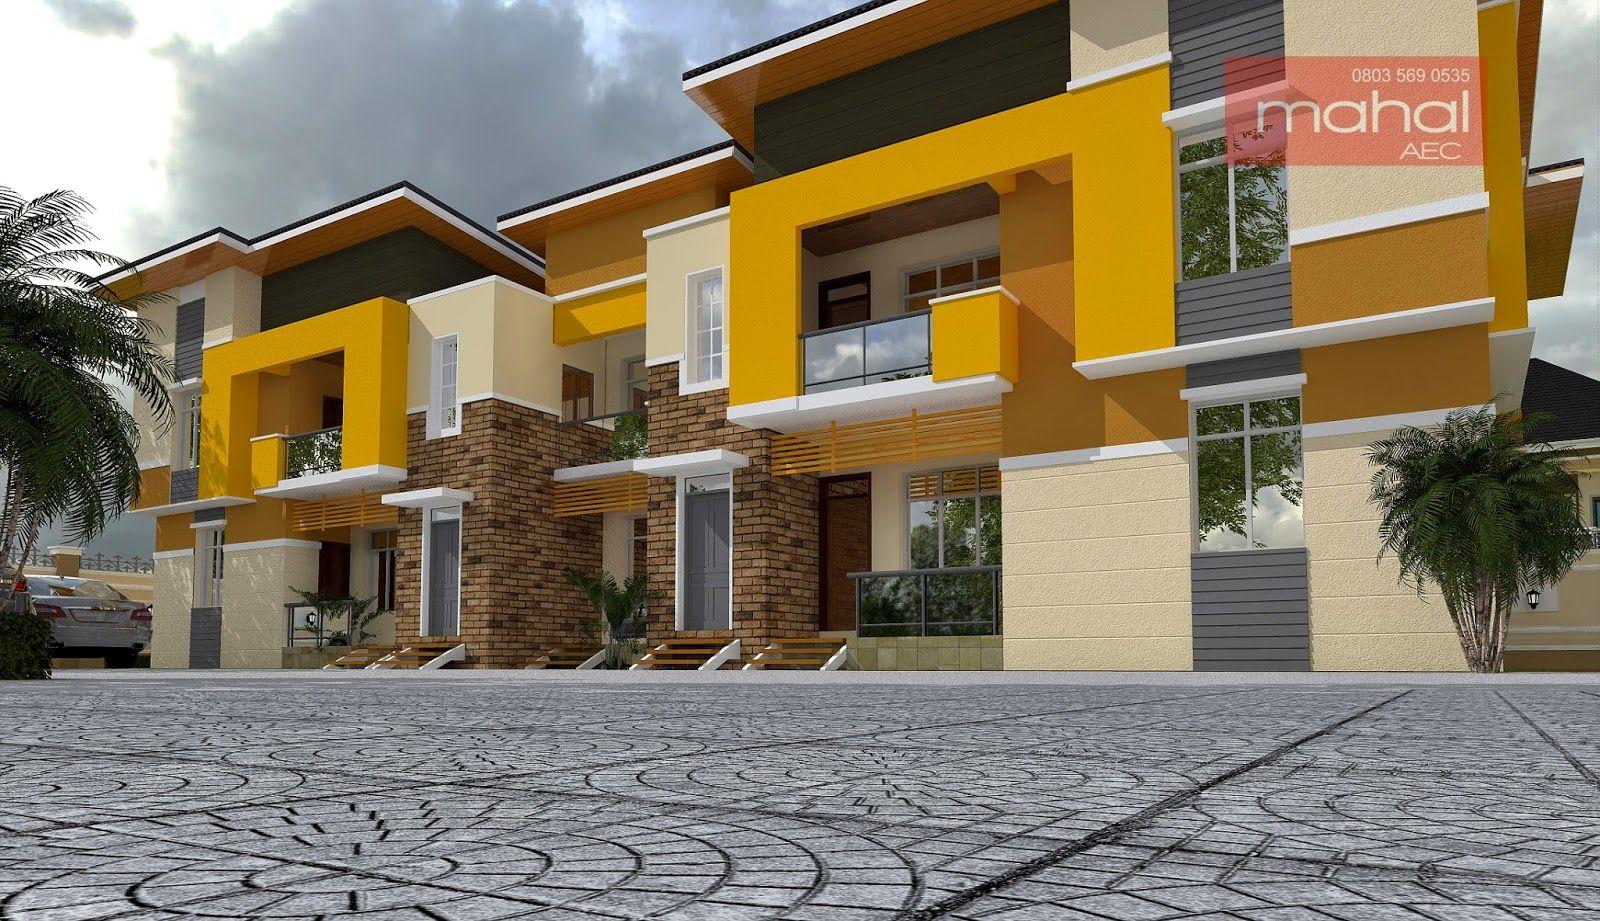 Contemporary nigerian residential architecture architecture résidentielle richesse